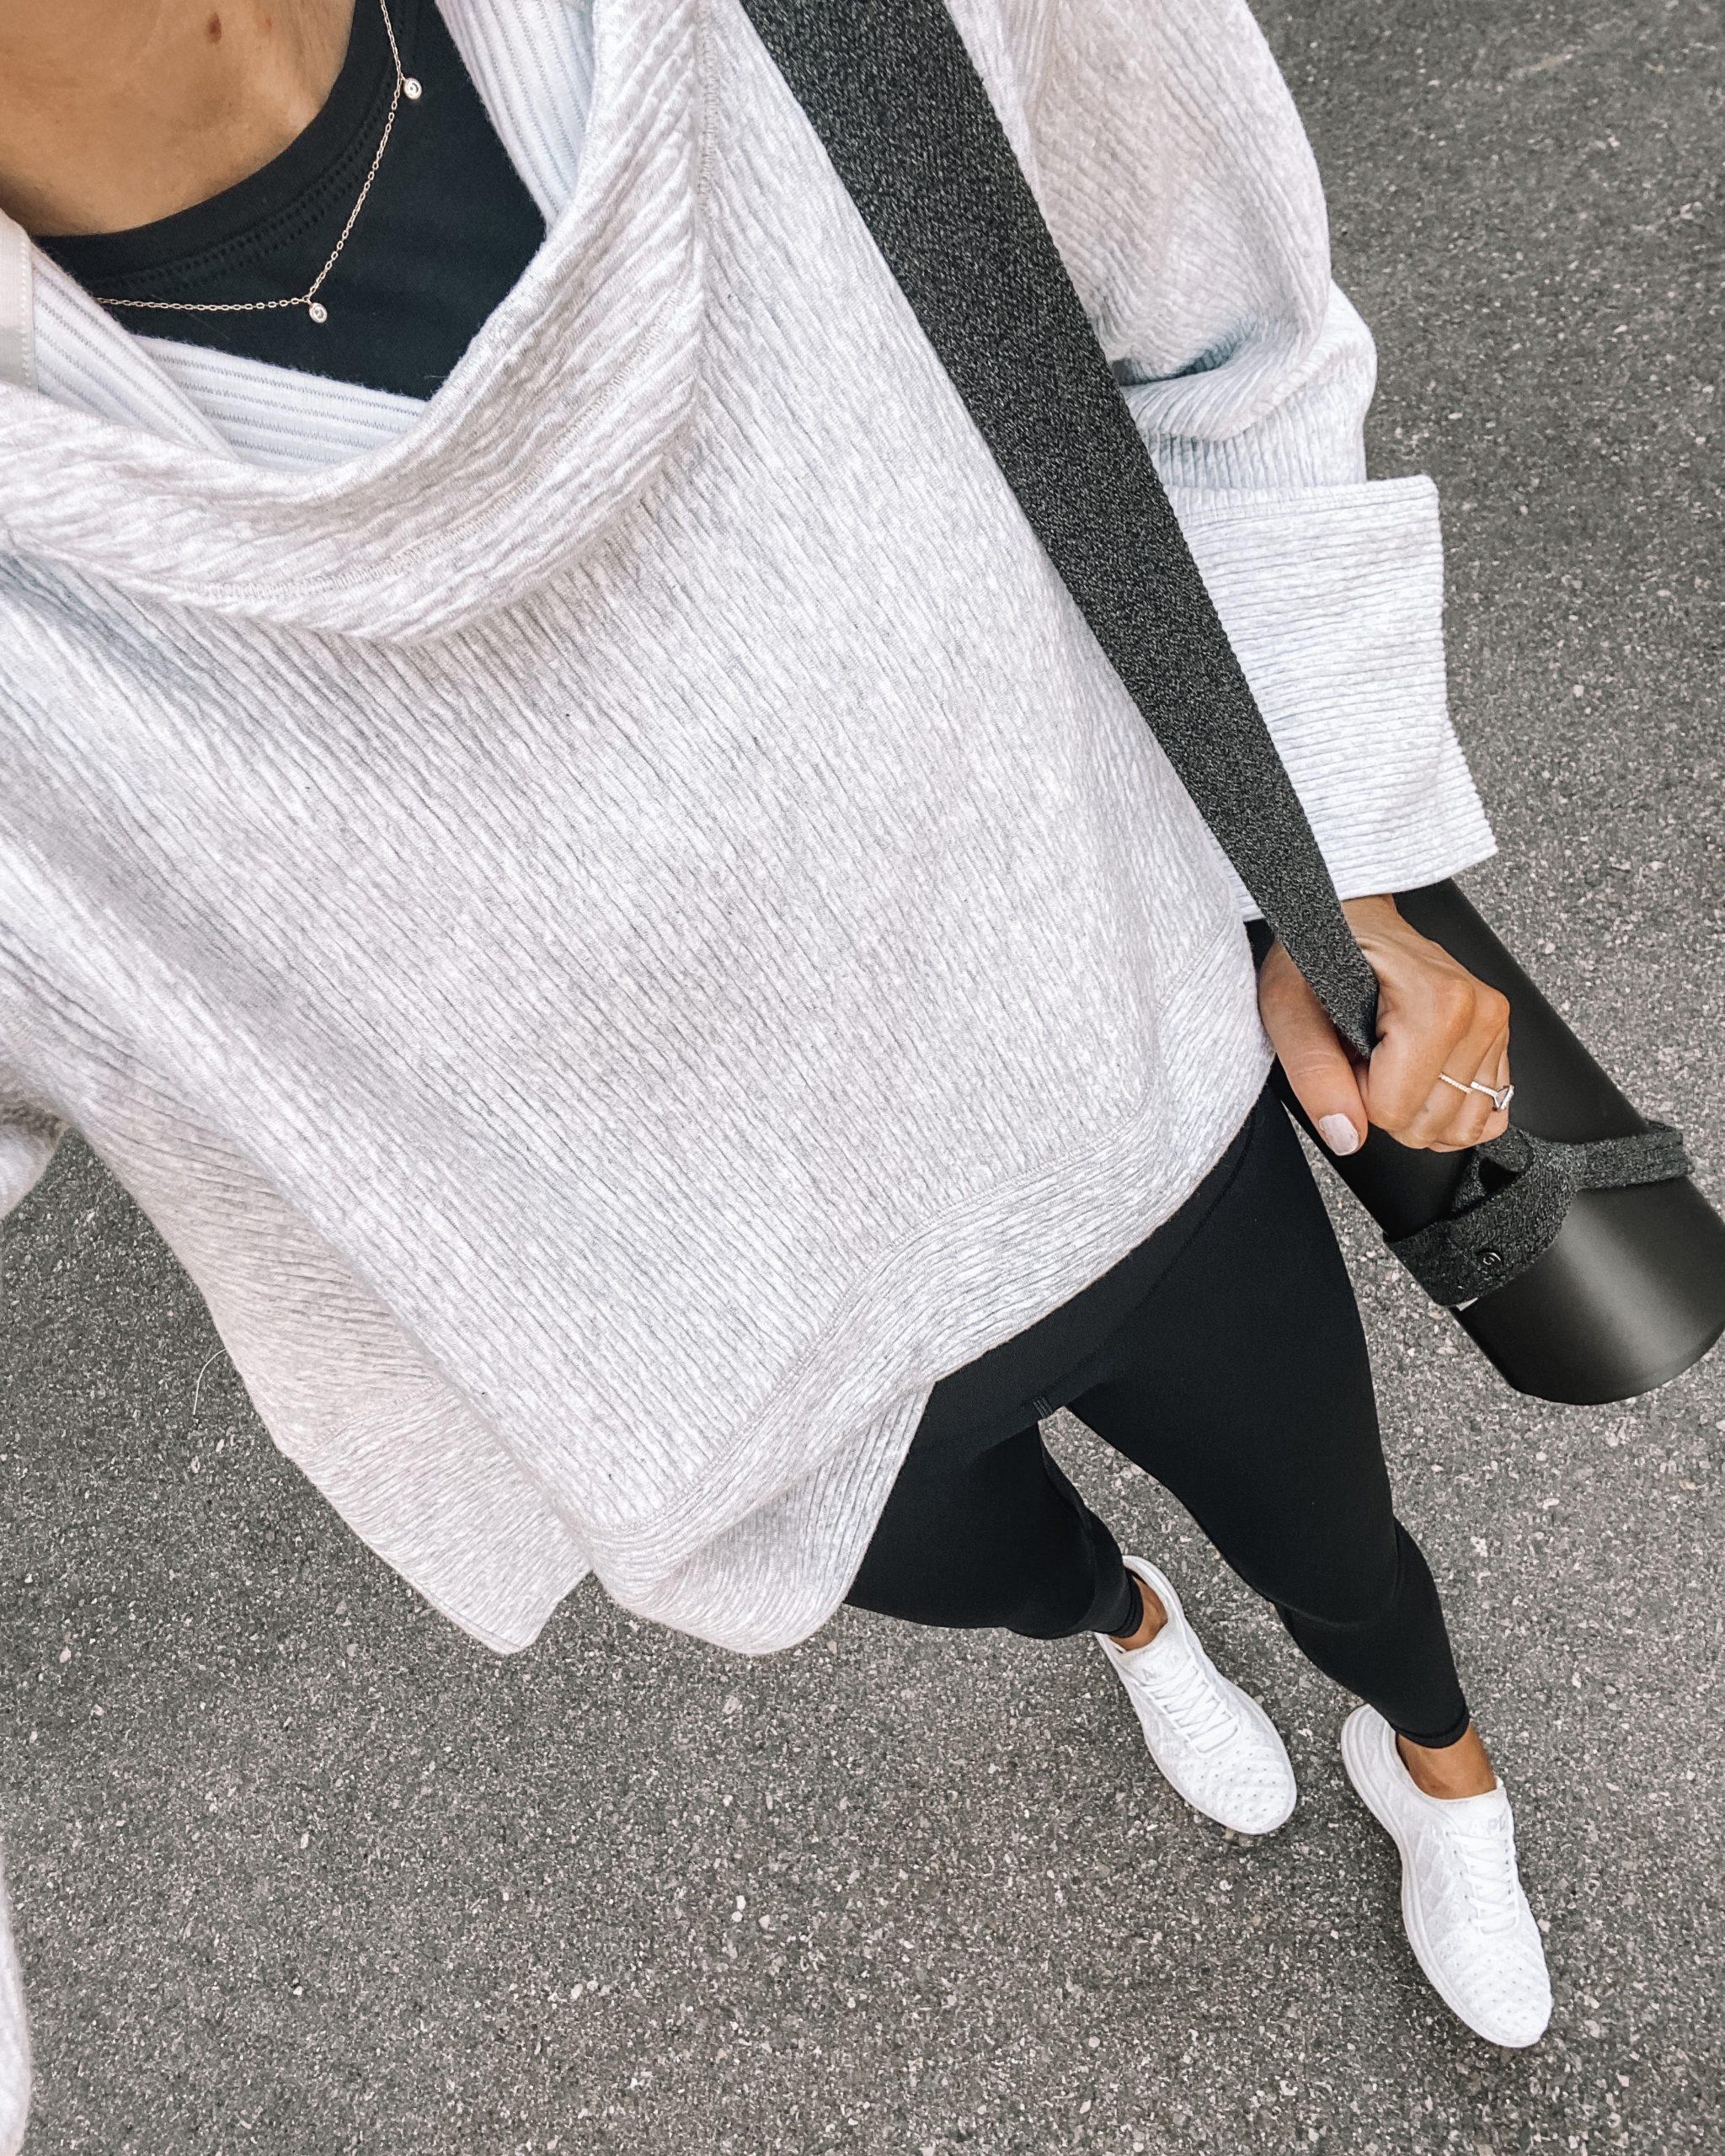 Fashion Jackson Wearing lululemon Grey Hoodie Sweatshirt Black Leggings White Sneakers Black Yoga Mat